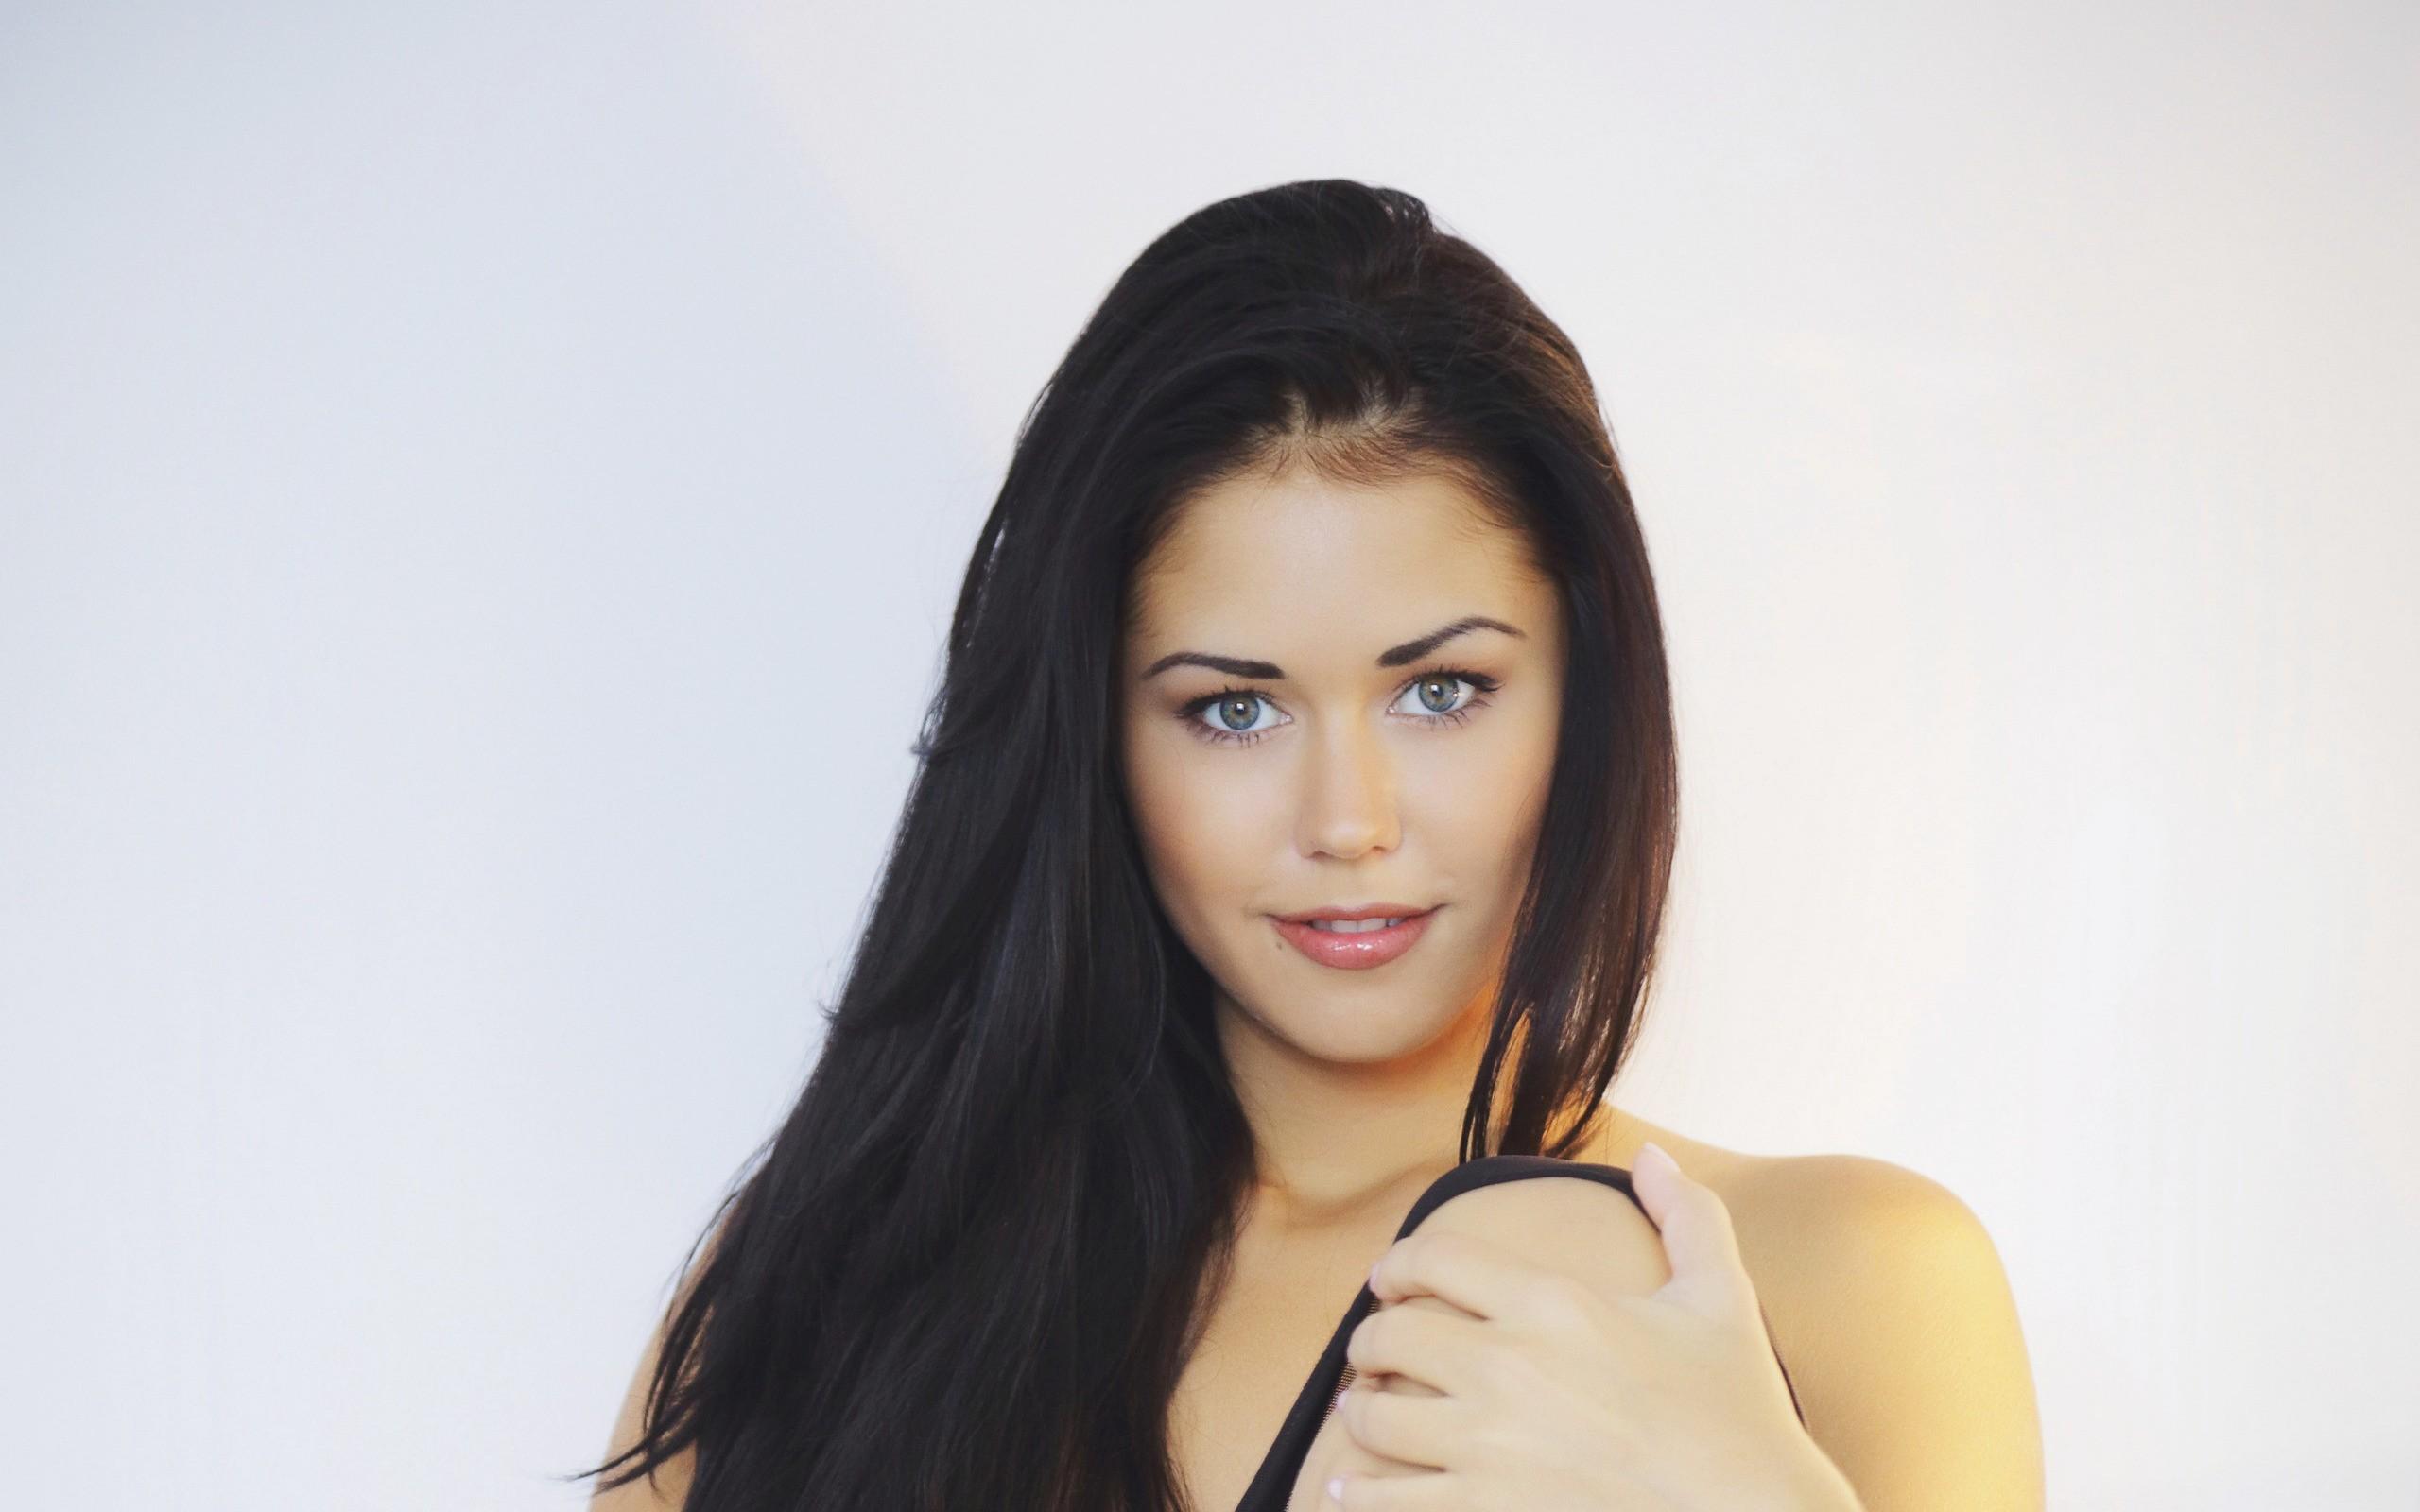 Blue Eyes Models Met Art Magazine Nude Ukrainian Macy B Wallpaper